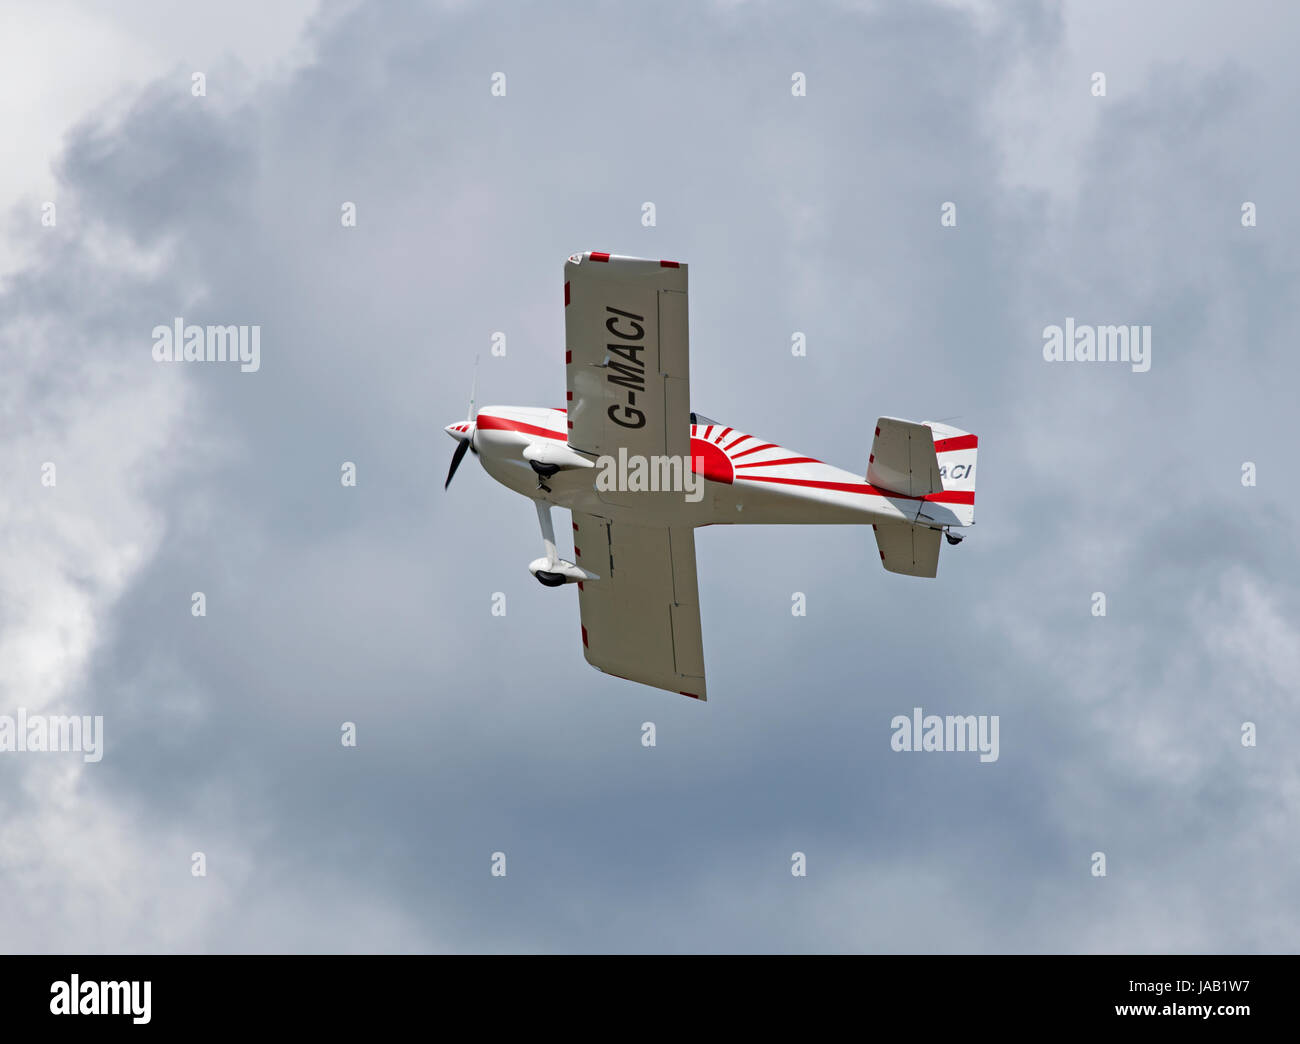 RV-7 Vans kit build aircraft departing its home base at Inverness Airport Scotland. - Stock Image